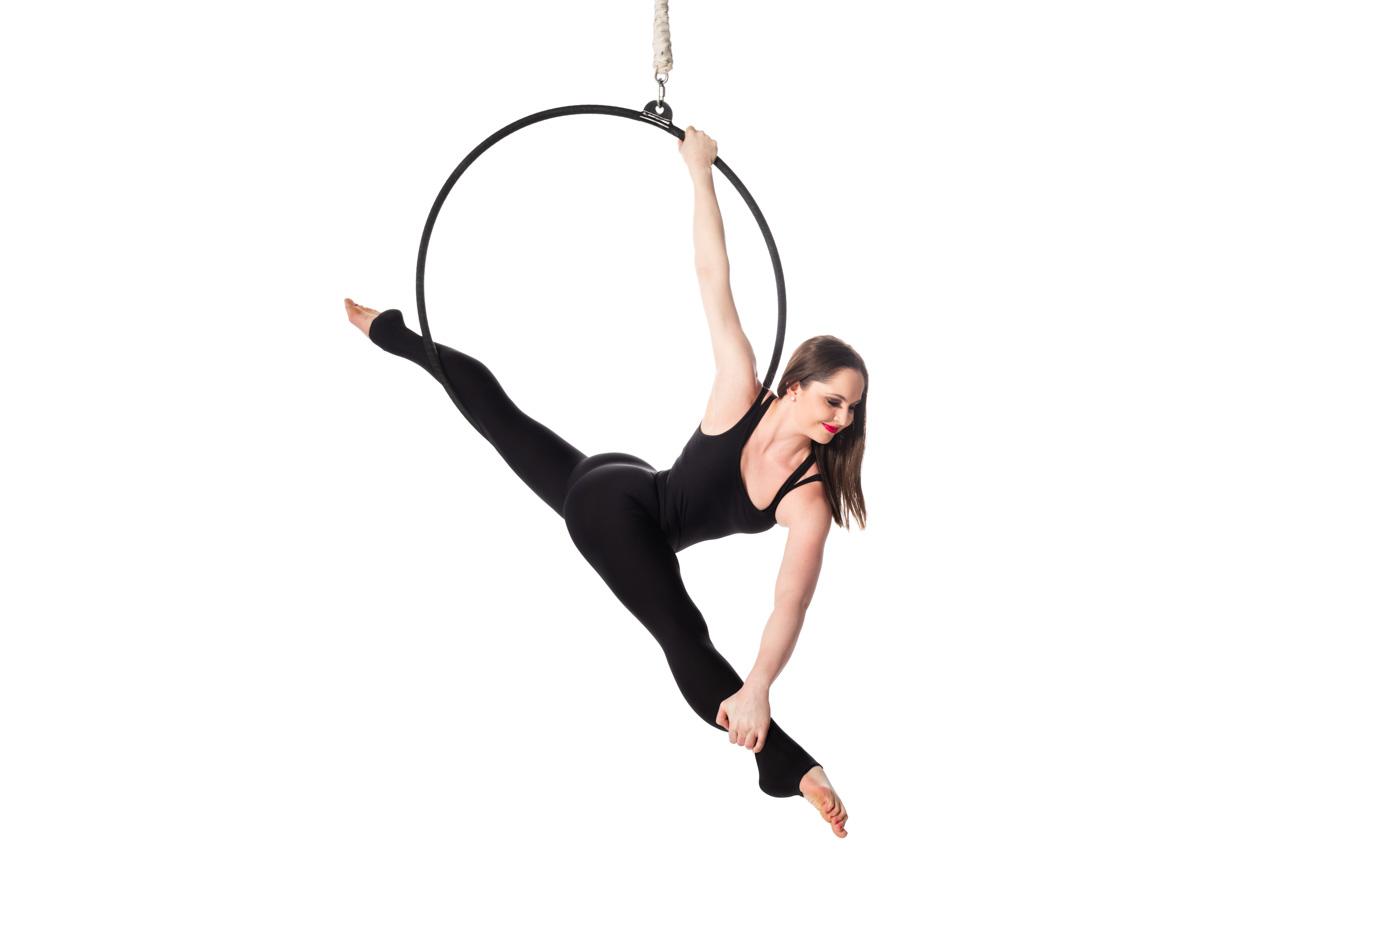 Woman in black leotard in split pose on lyra